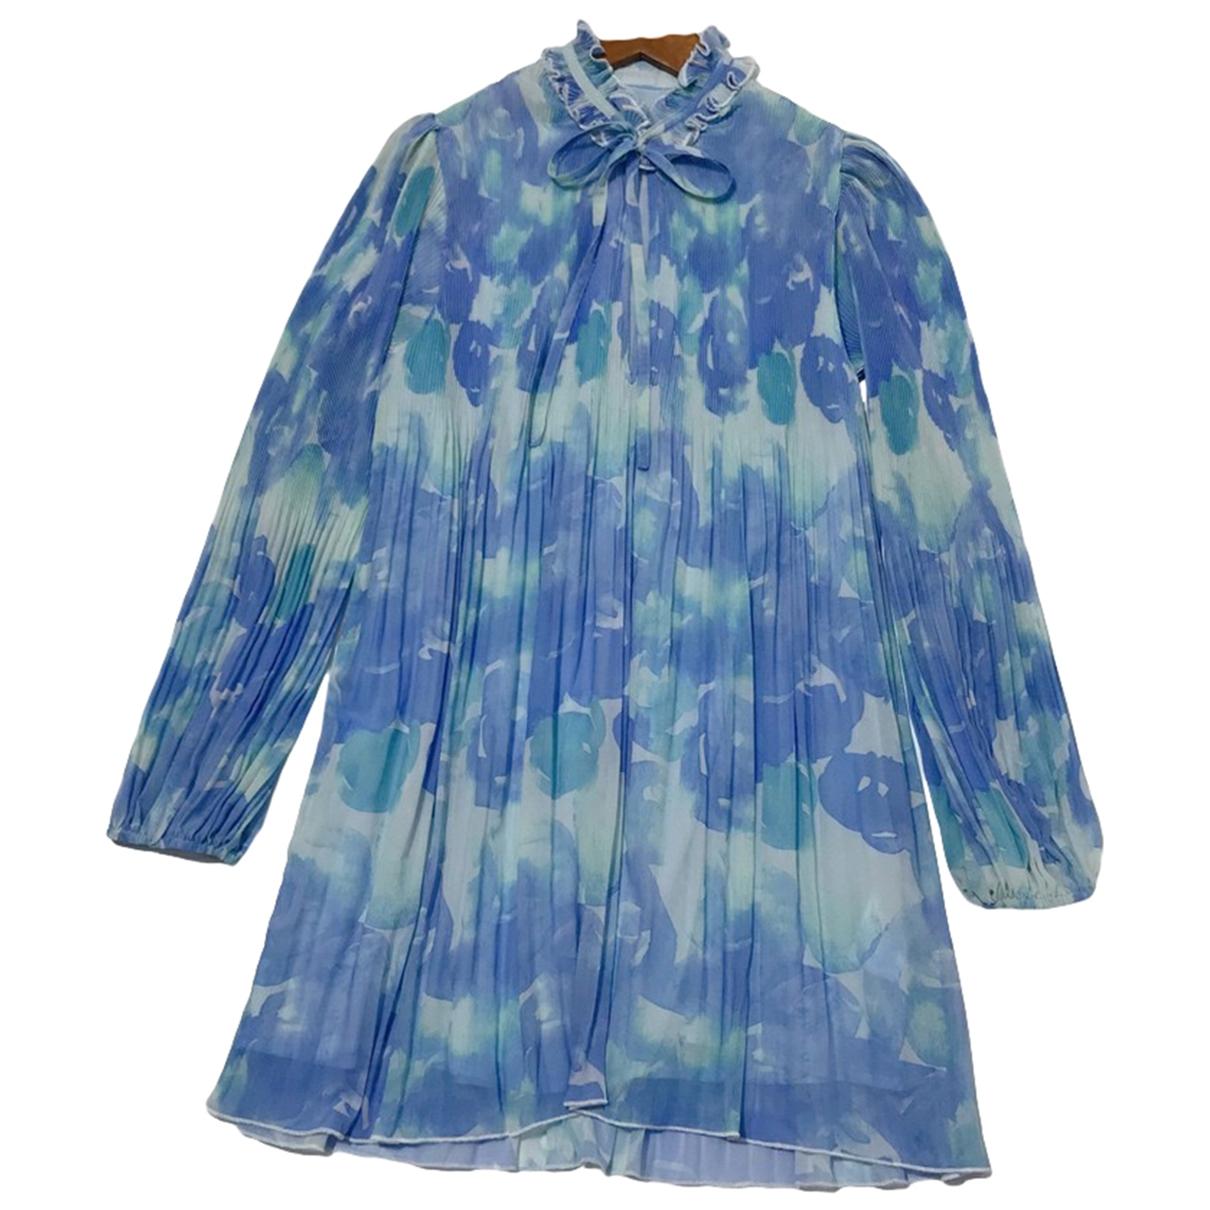 Ganni Spring Summer 2020 Kleid in  Blau Synthetik